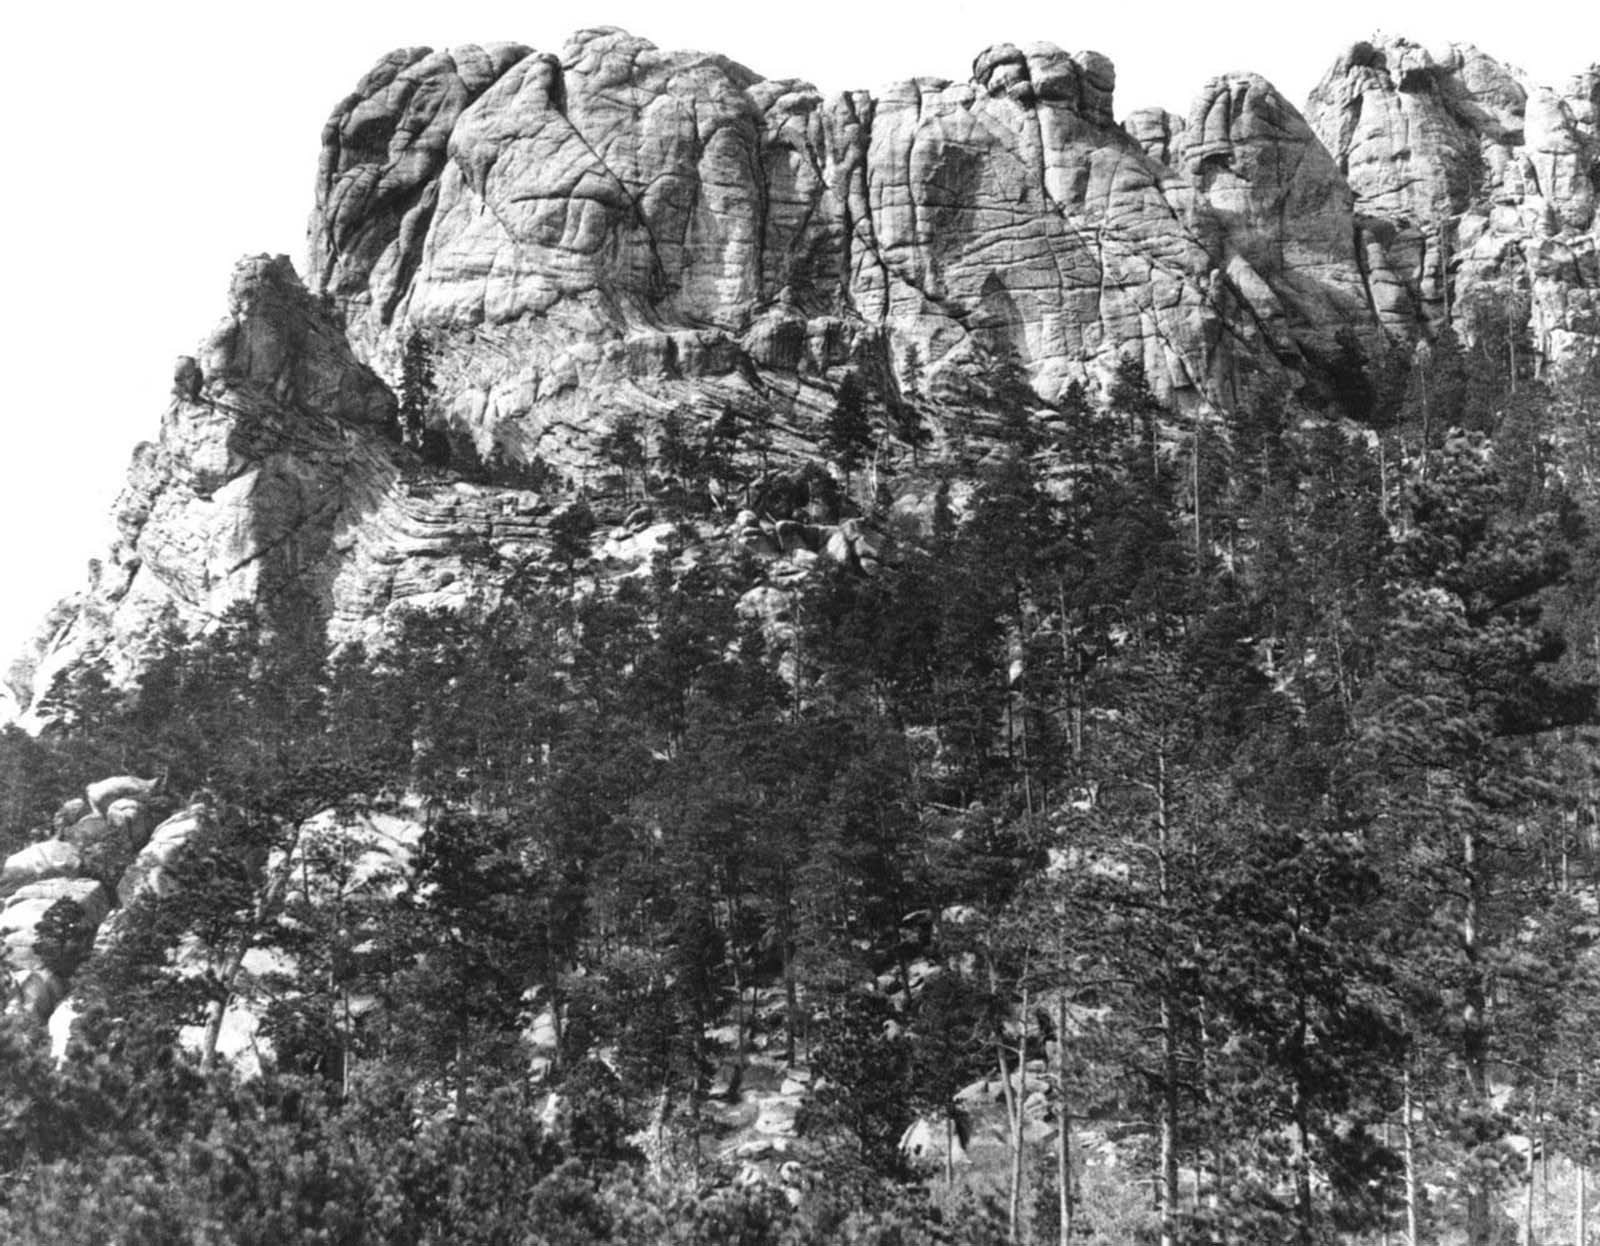 Mount Rushmore (Six Grandfathers) before construction, circa 1905